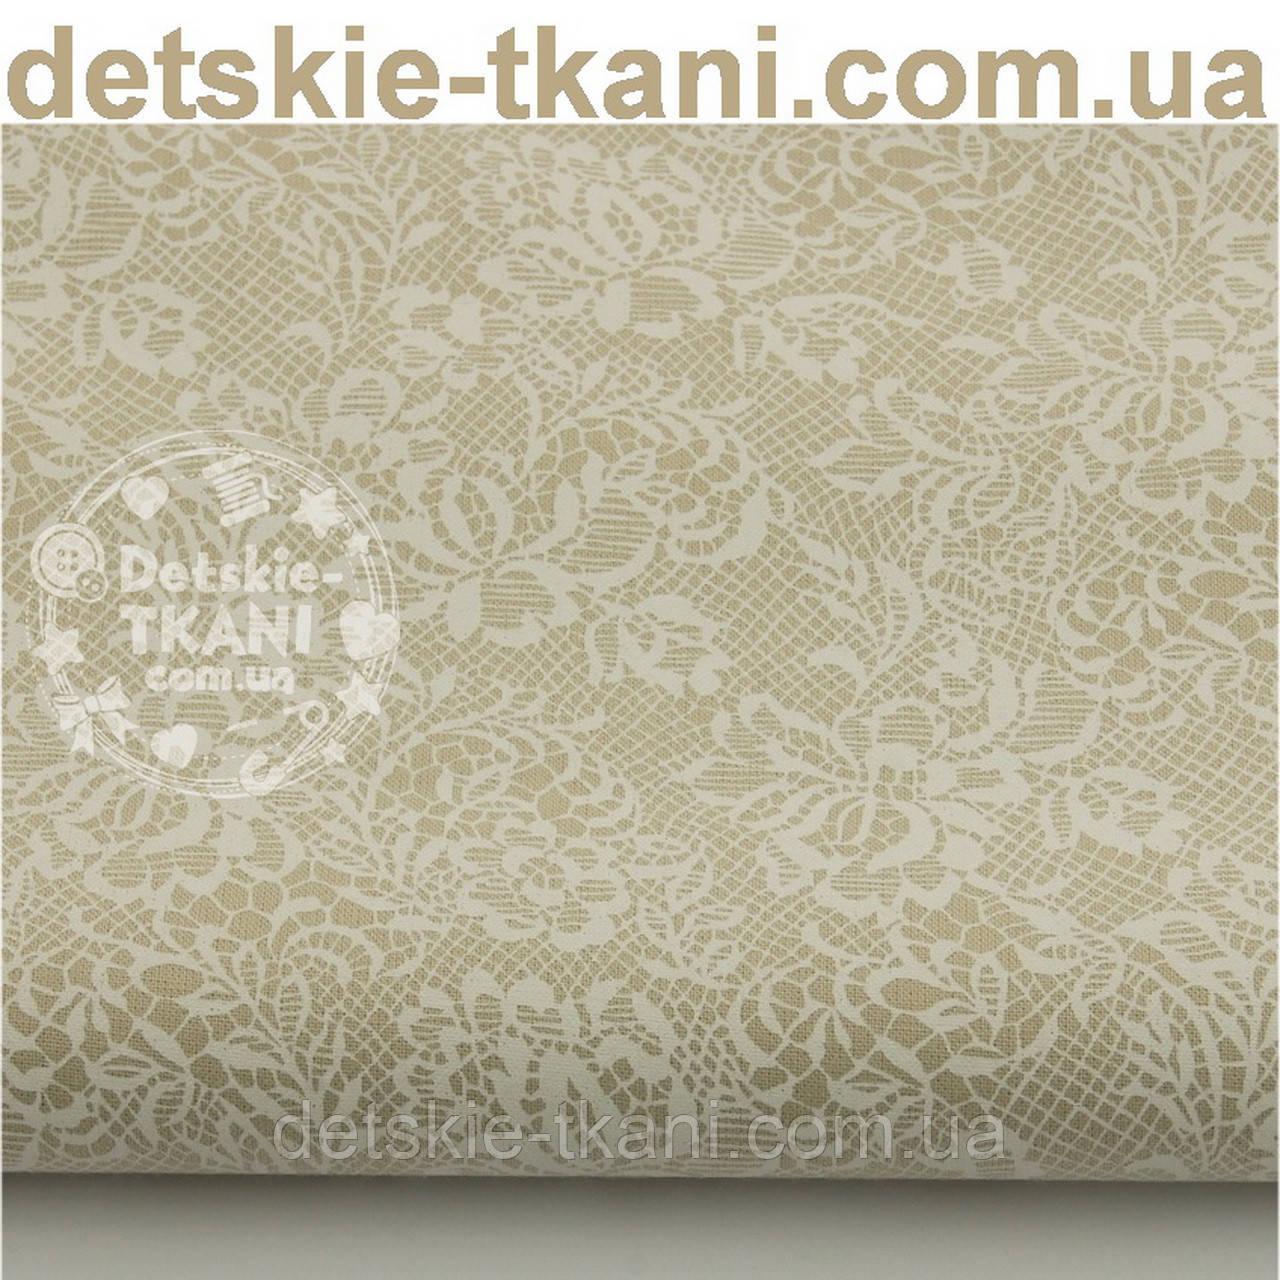 Отрез ткани 75*155 с кружевным узором, белого цвета на бежевом фоне № 646 б